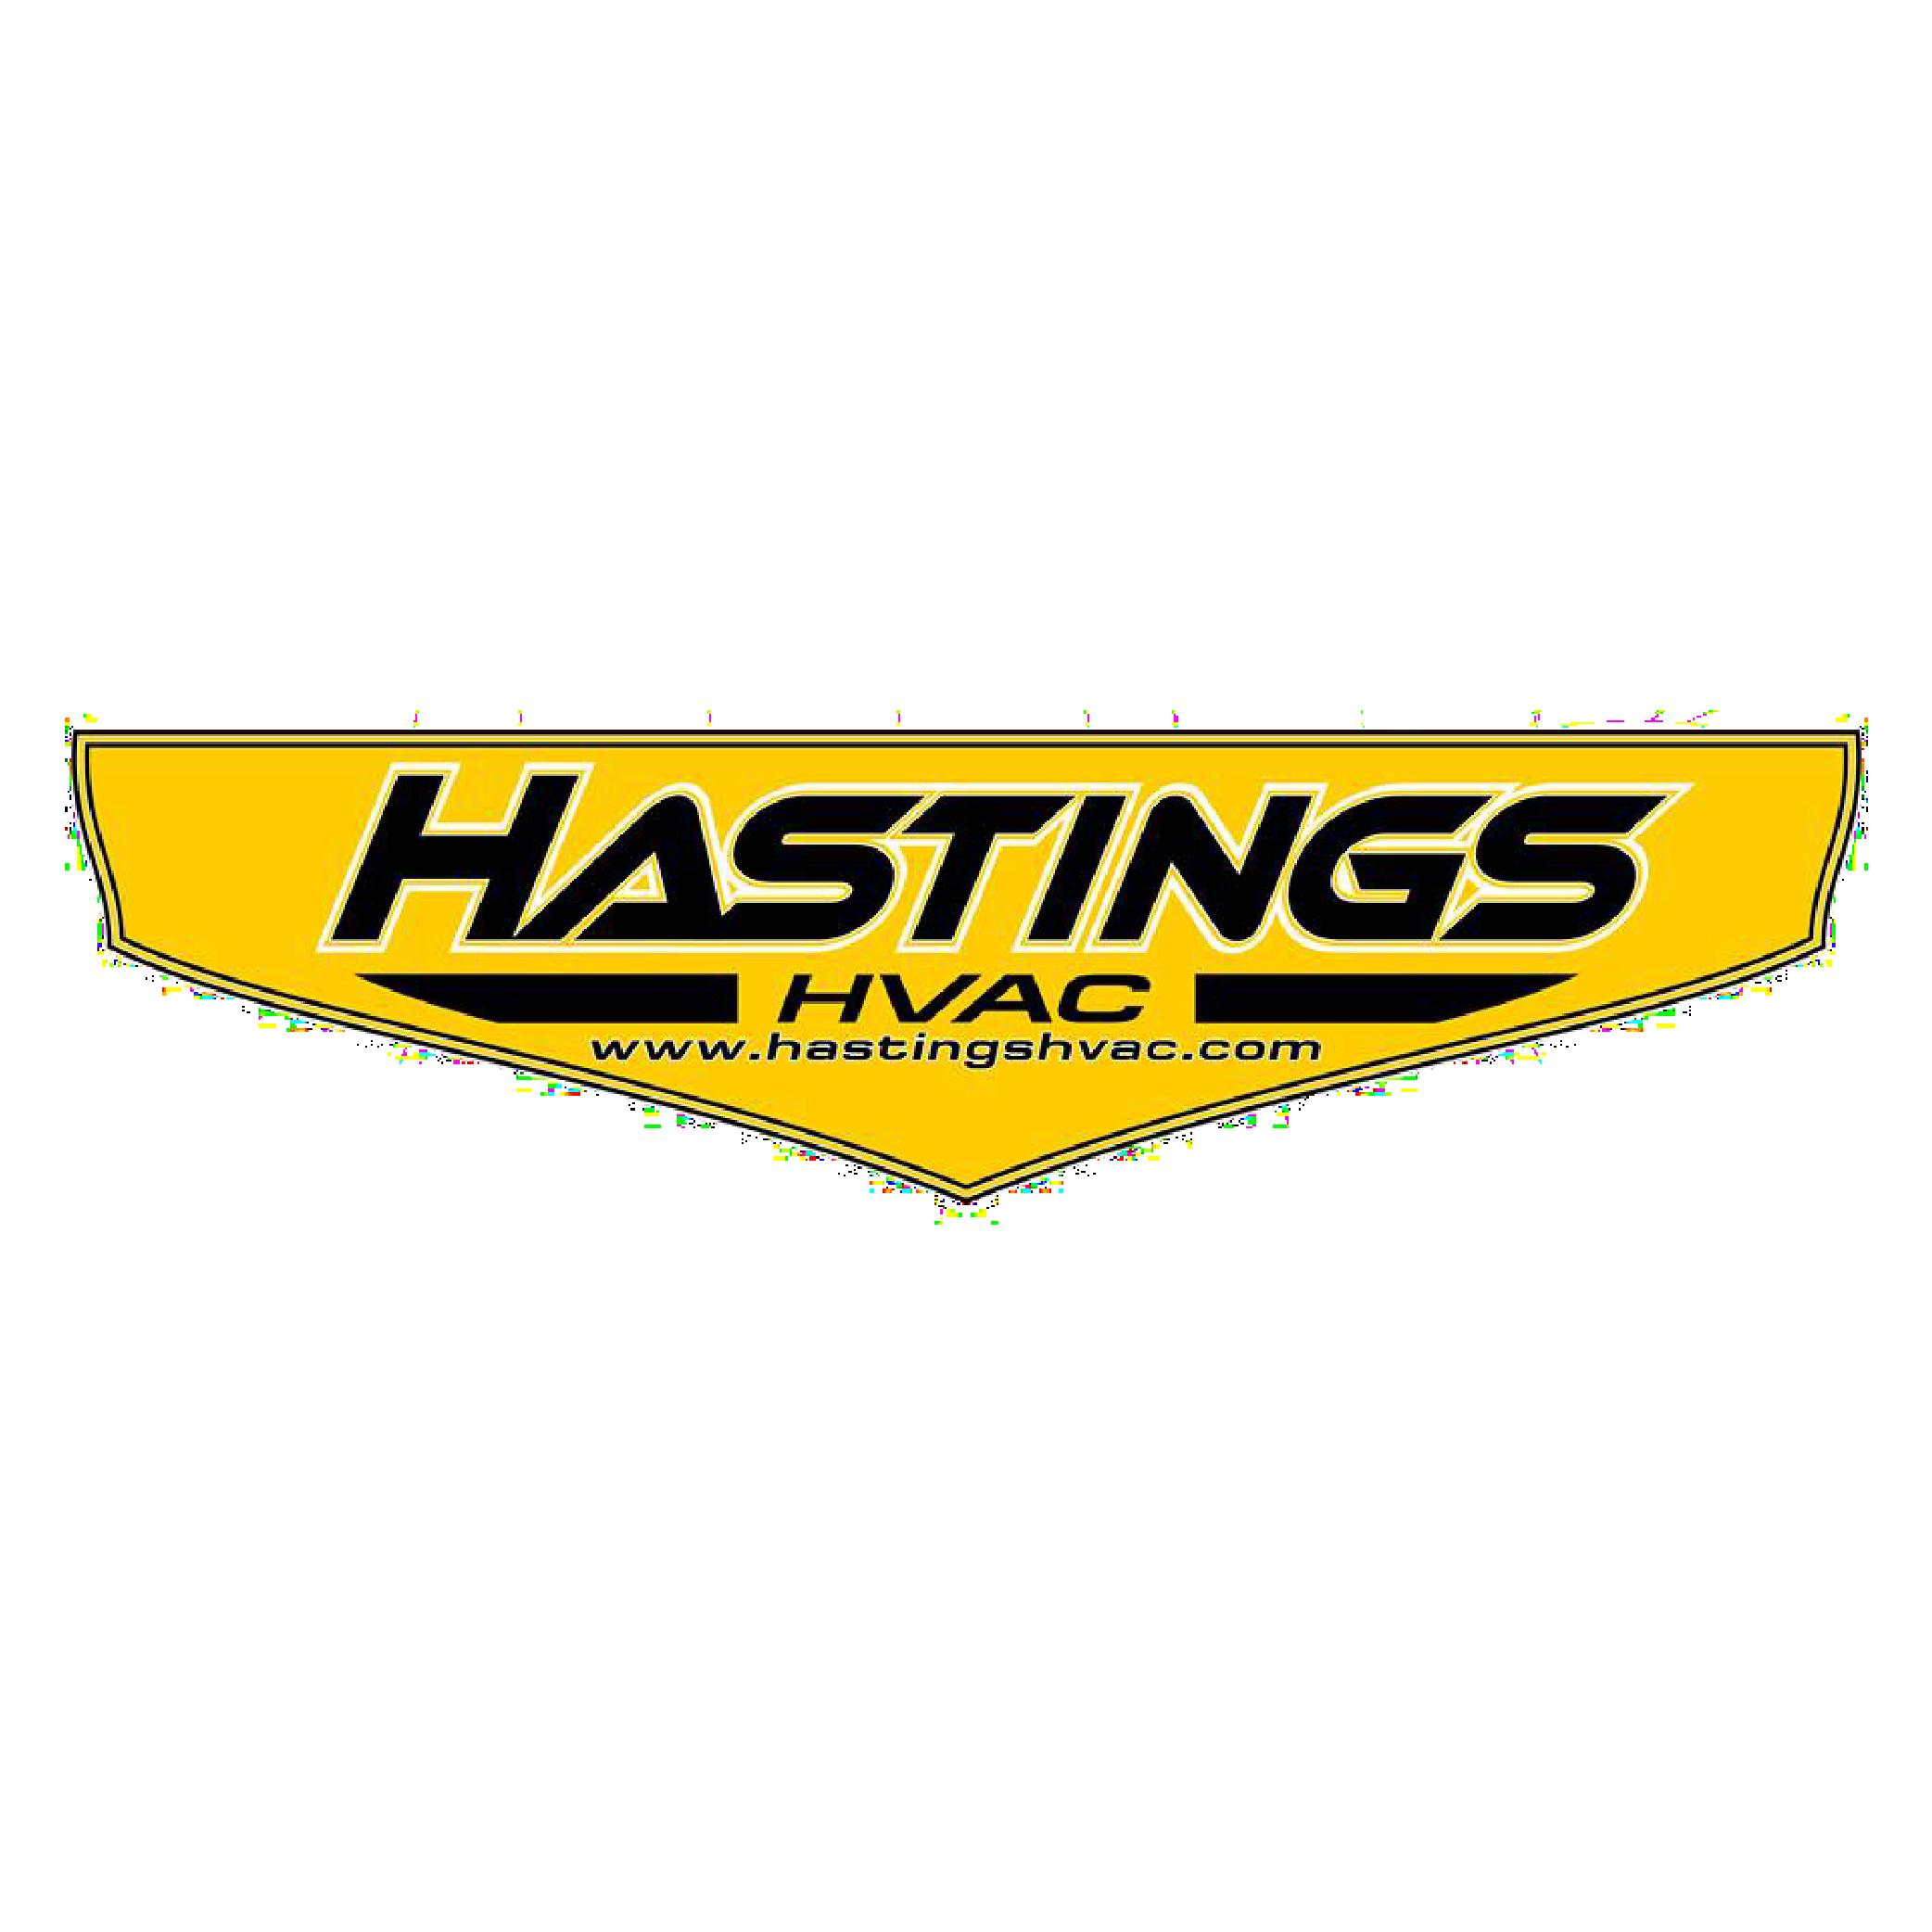 Copy of Hastings HVAC